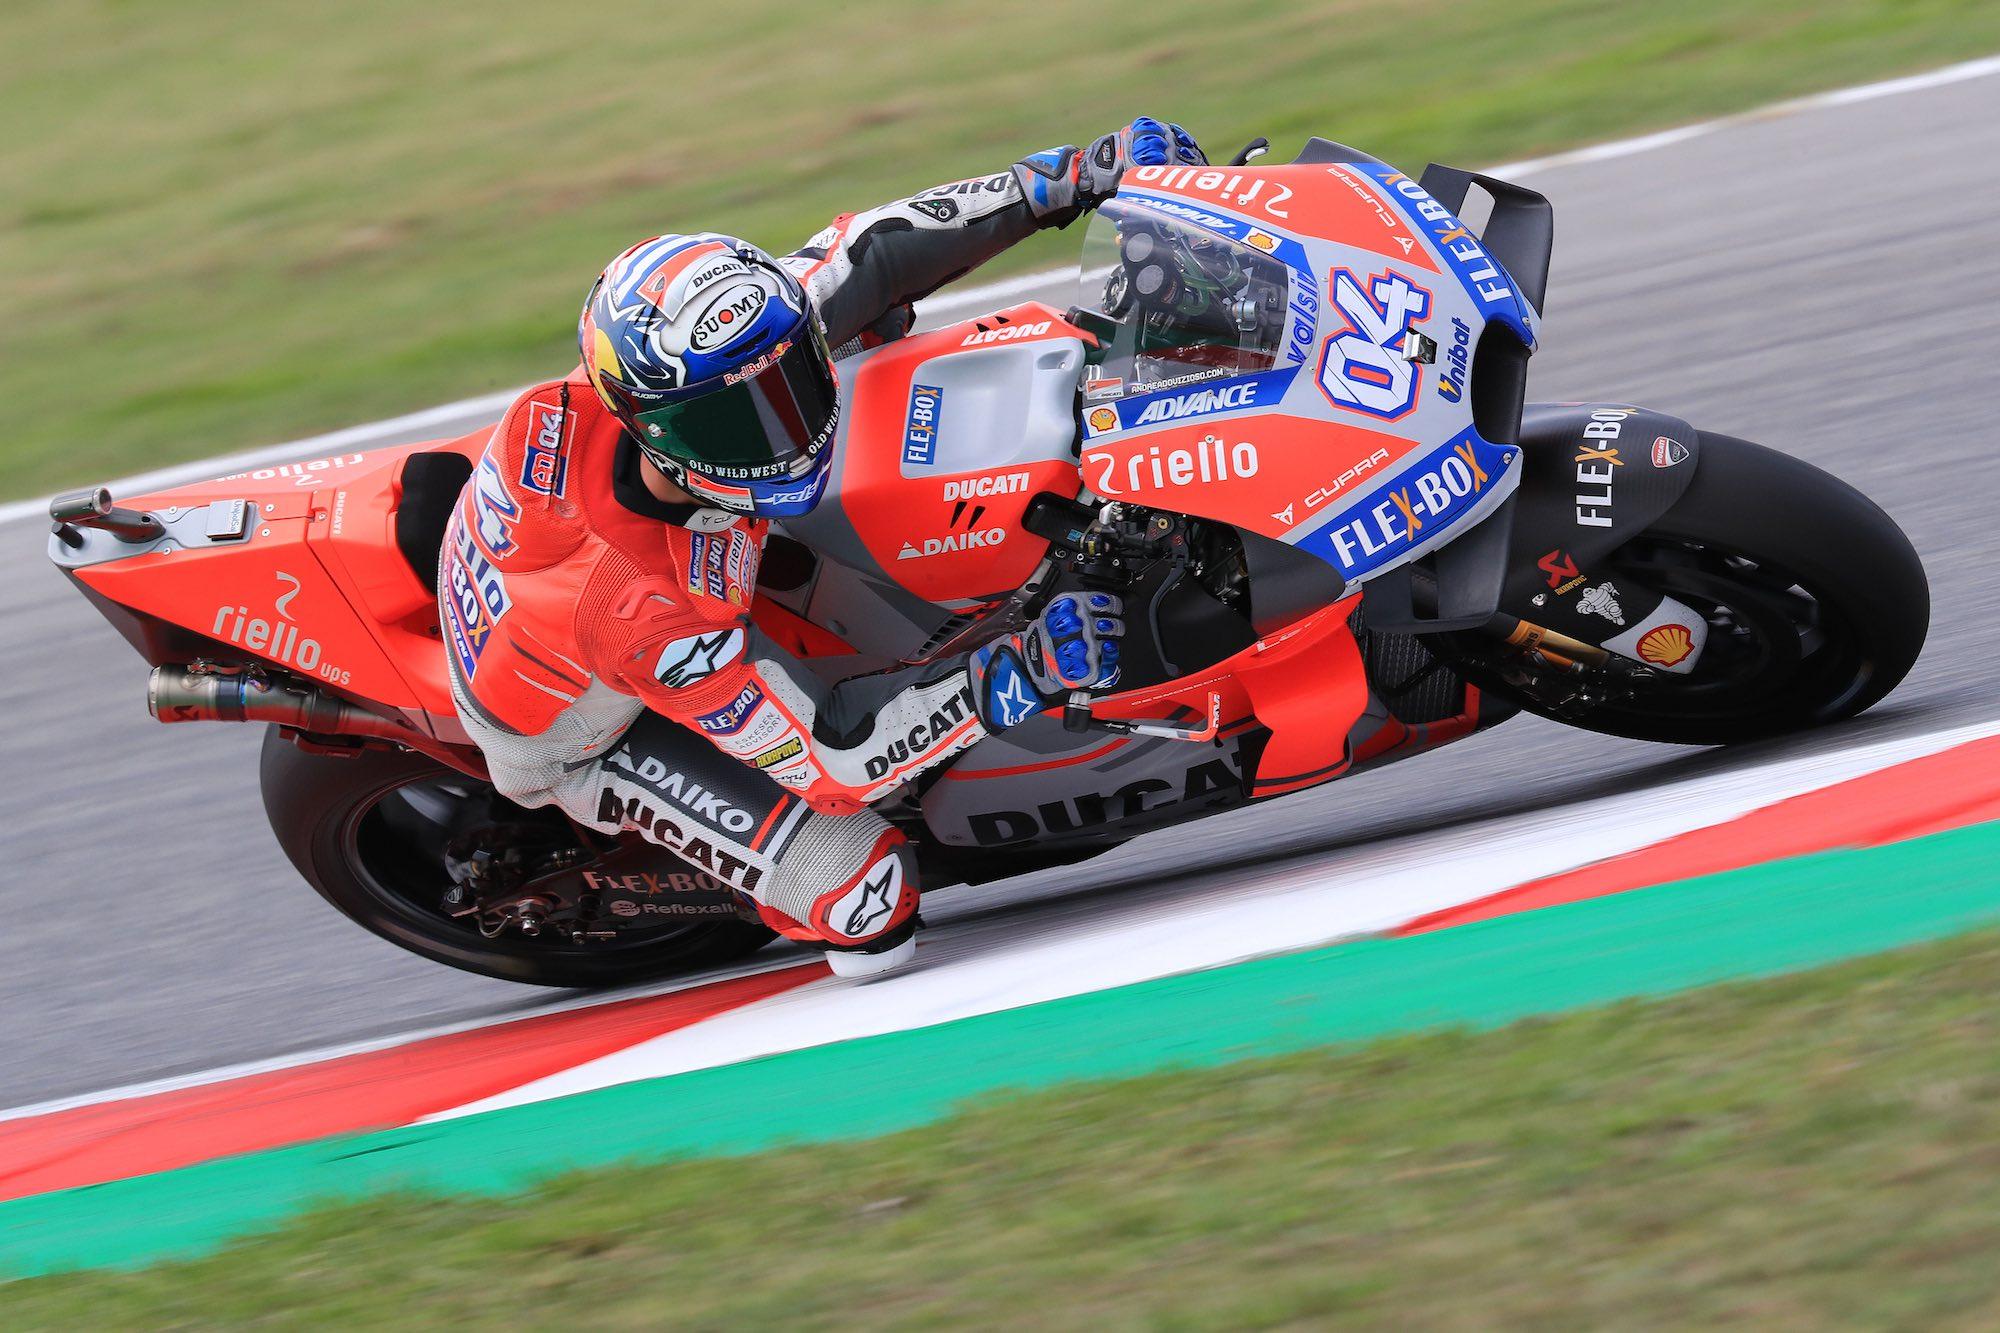 Andrea Dovizioso y Jorge Lorenzo comienzan mandando en Misano